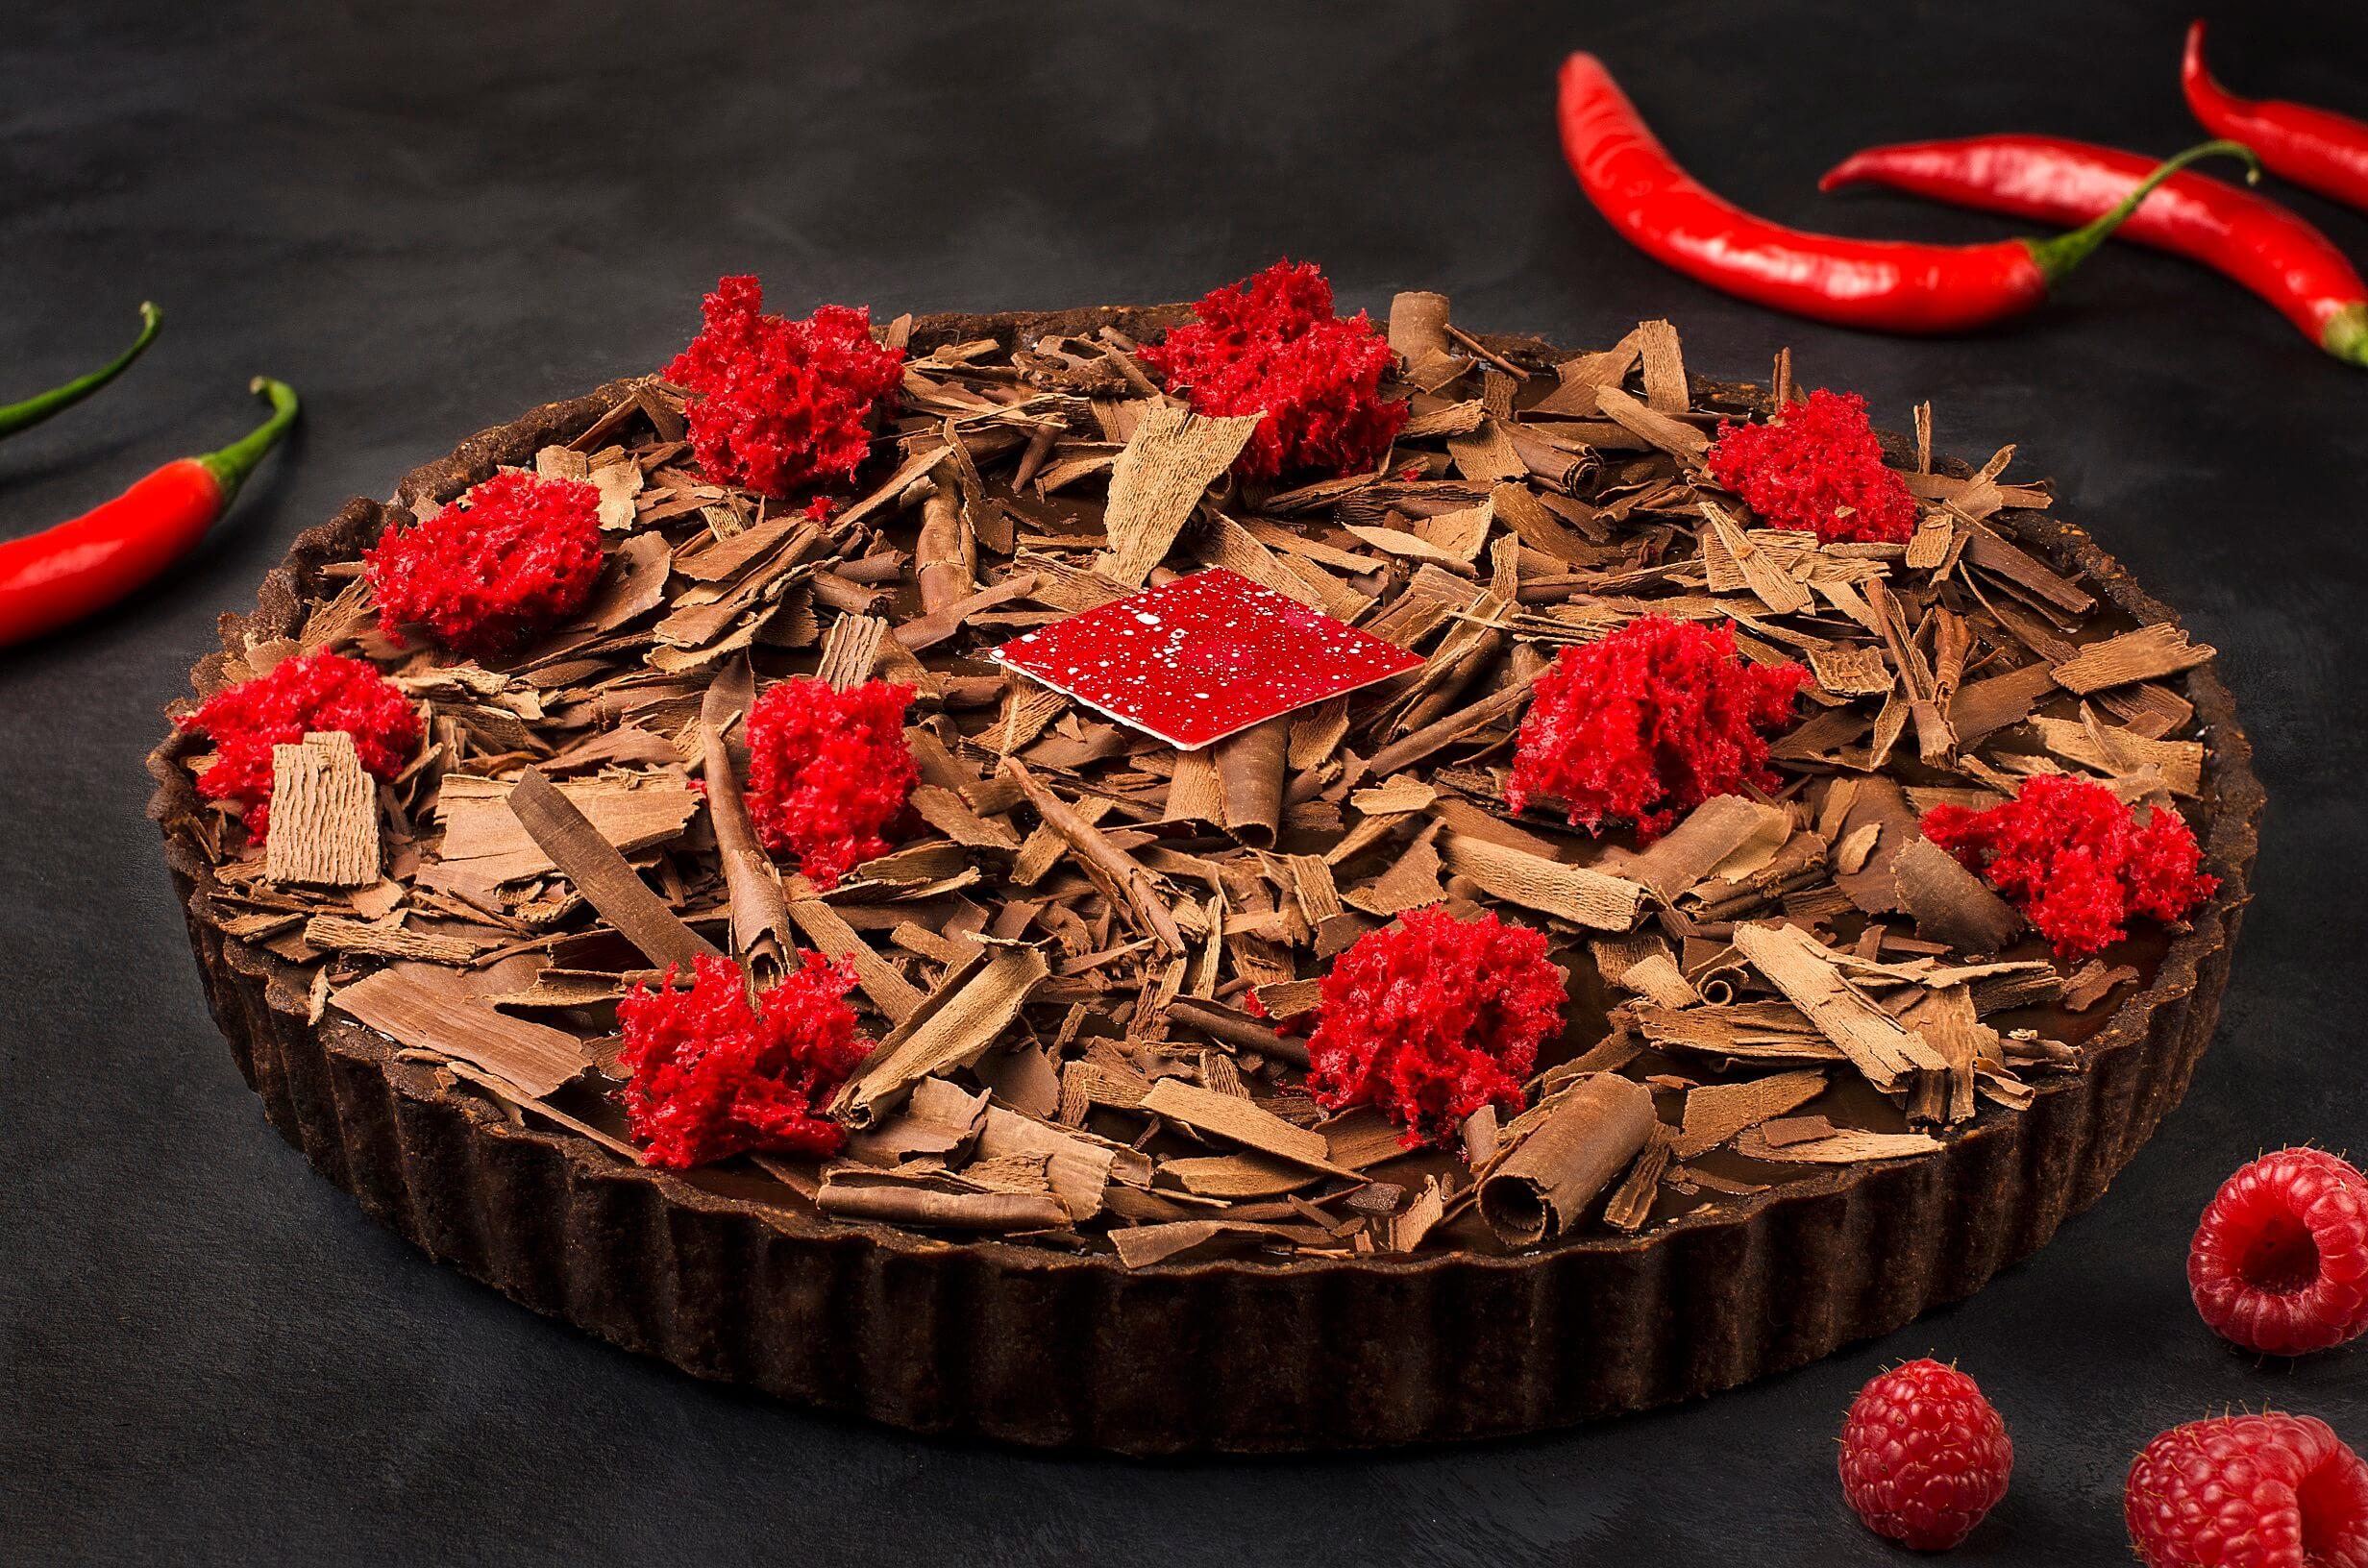 cremo-ciasto-czekolada-chili